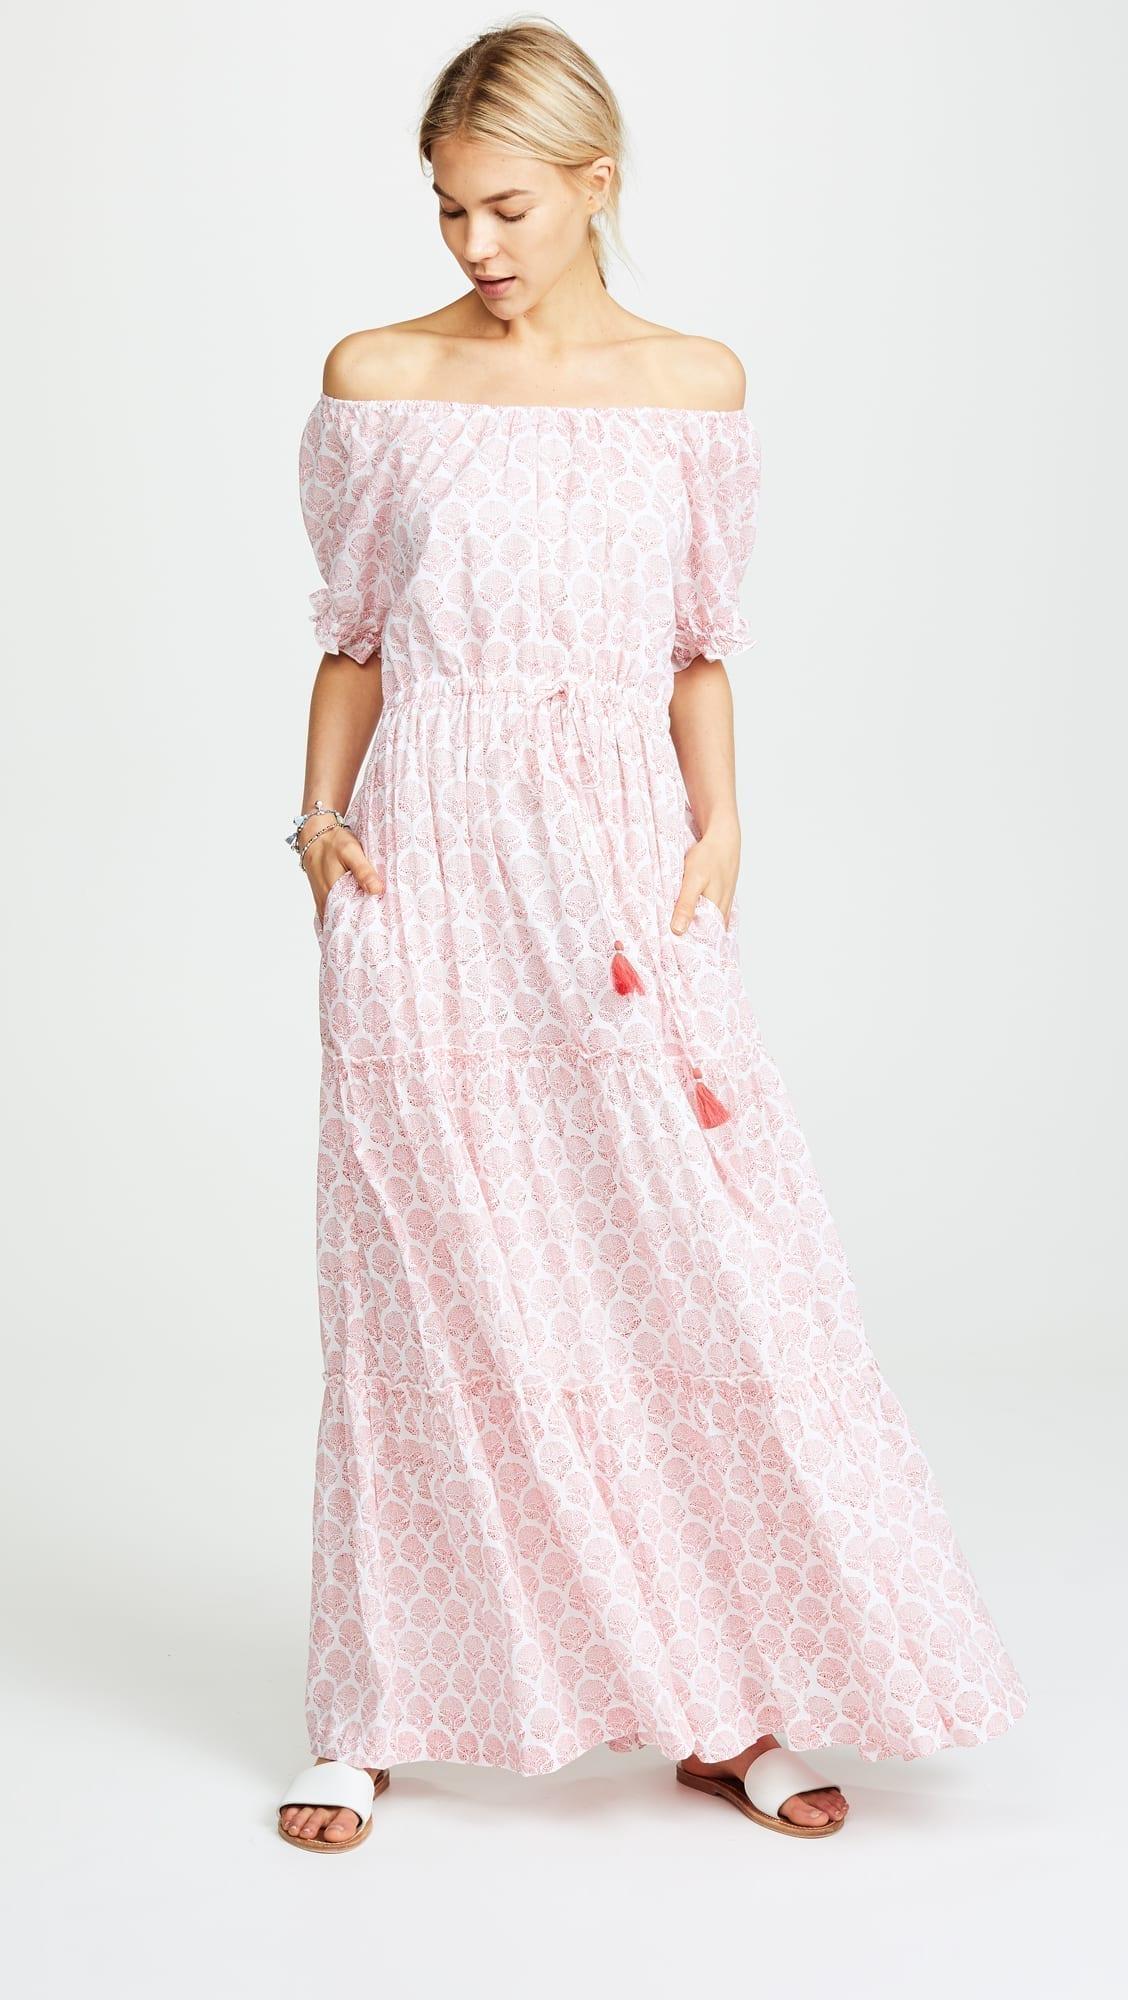 ROLLER RABBIT Rosemary Abha Coral Dress